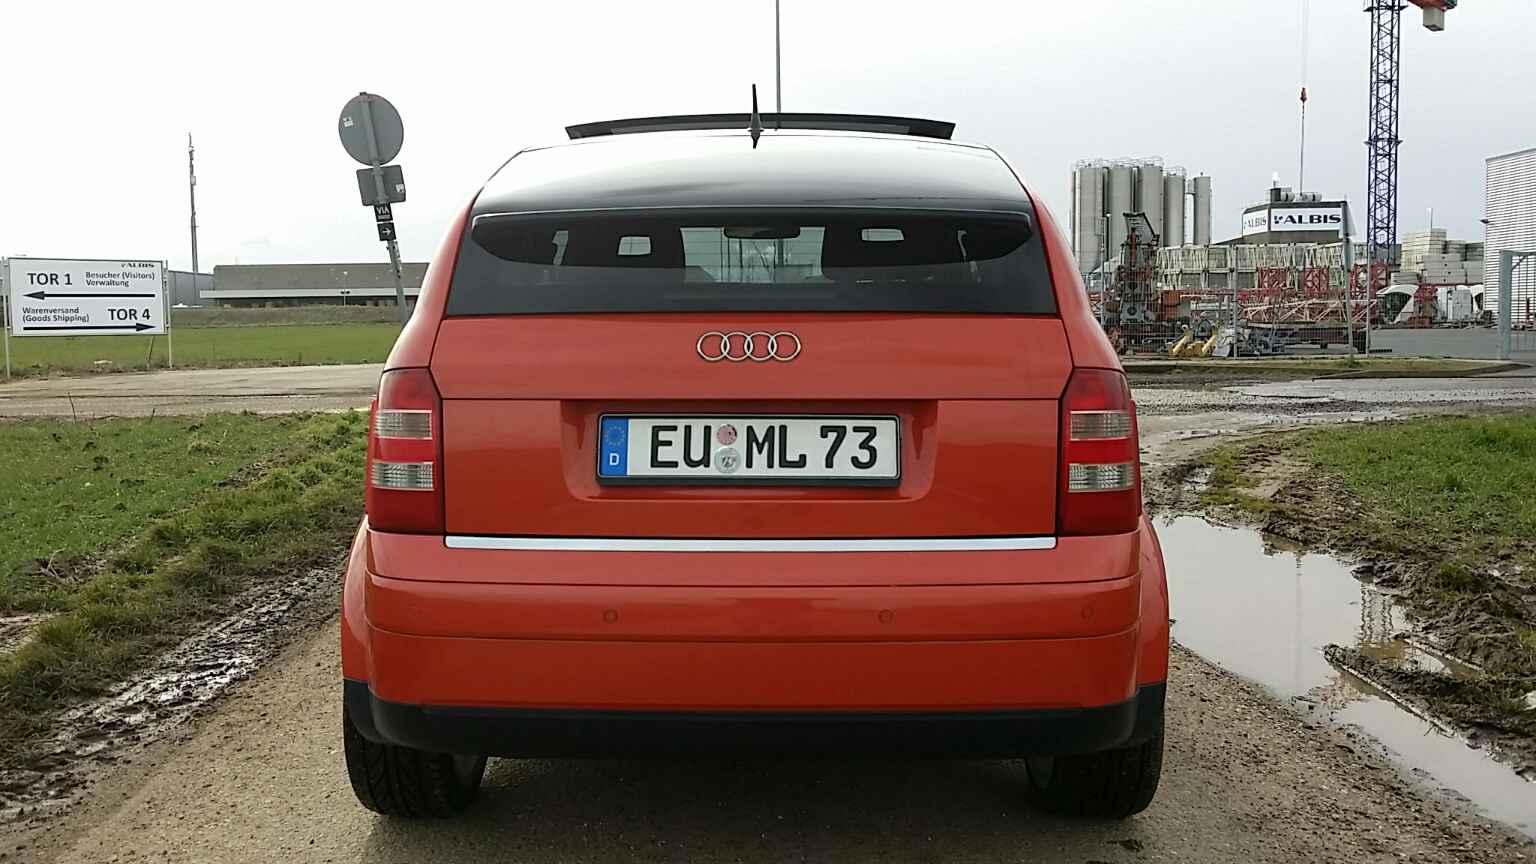 Audi03.jpg.11f81b6f6c168166d88fd4381fef1e7c.jpg